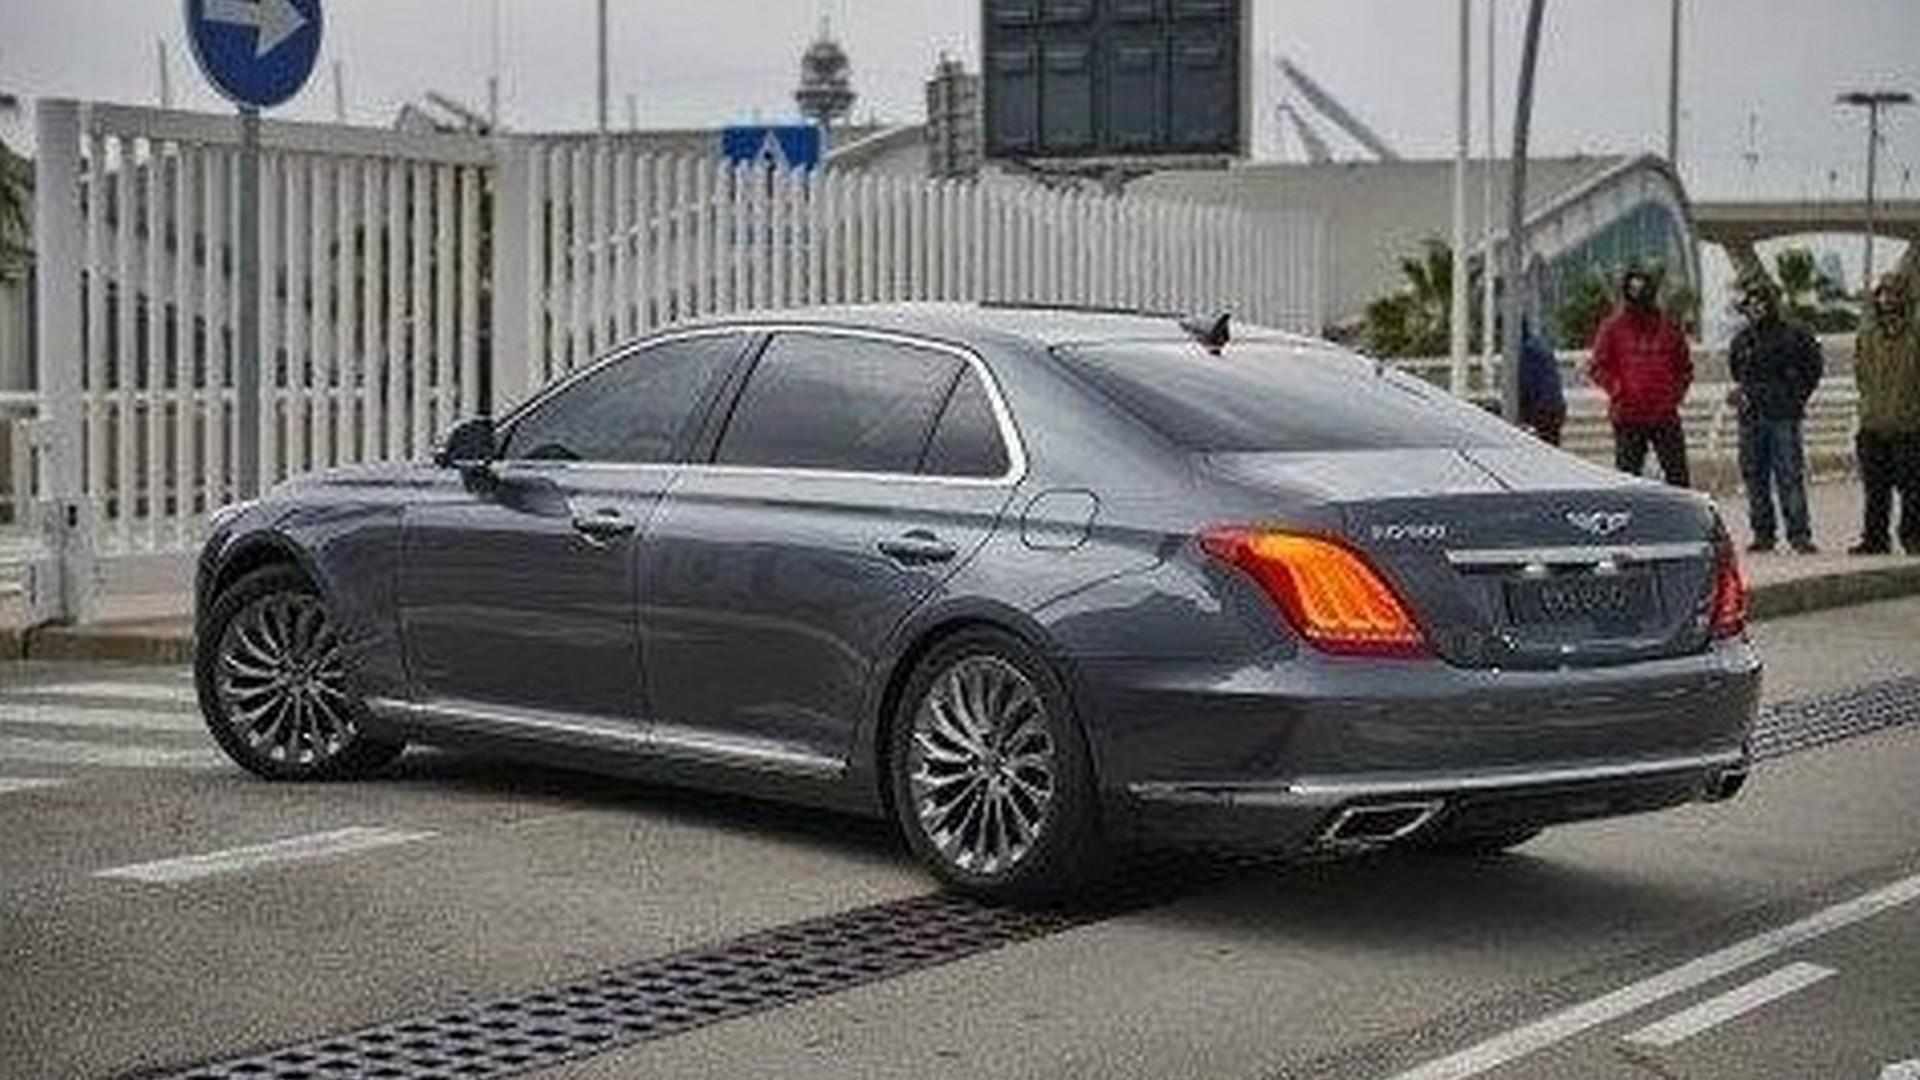 review price coupe car and driver reviews original spec photo r genesis hyundai s test